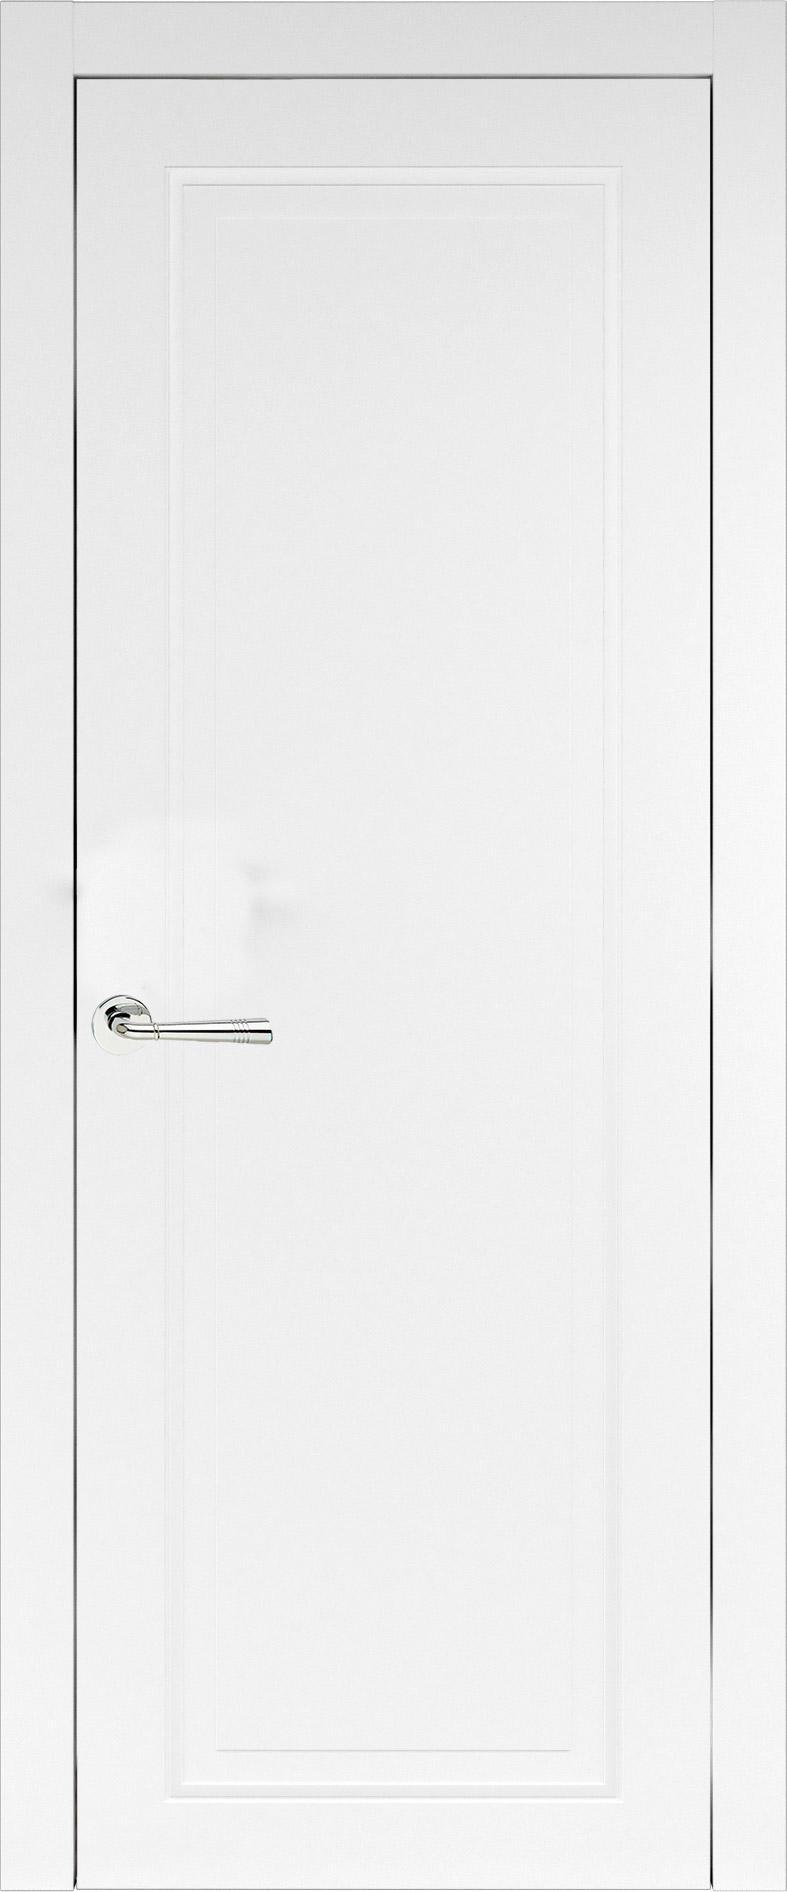 Domenica Neo Classic цвет - Белая эмаль (RAL 9003) Без стекла (ДГ)